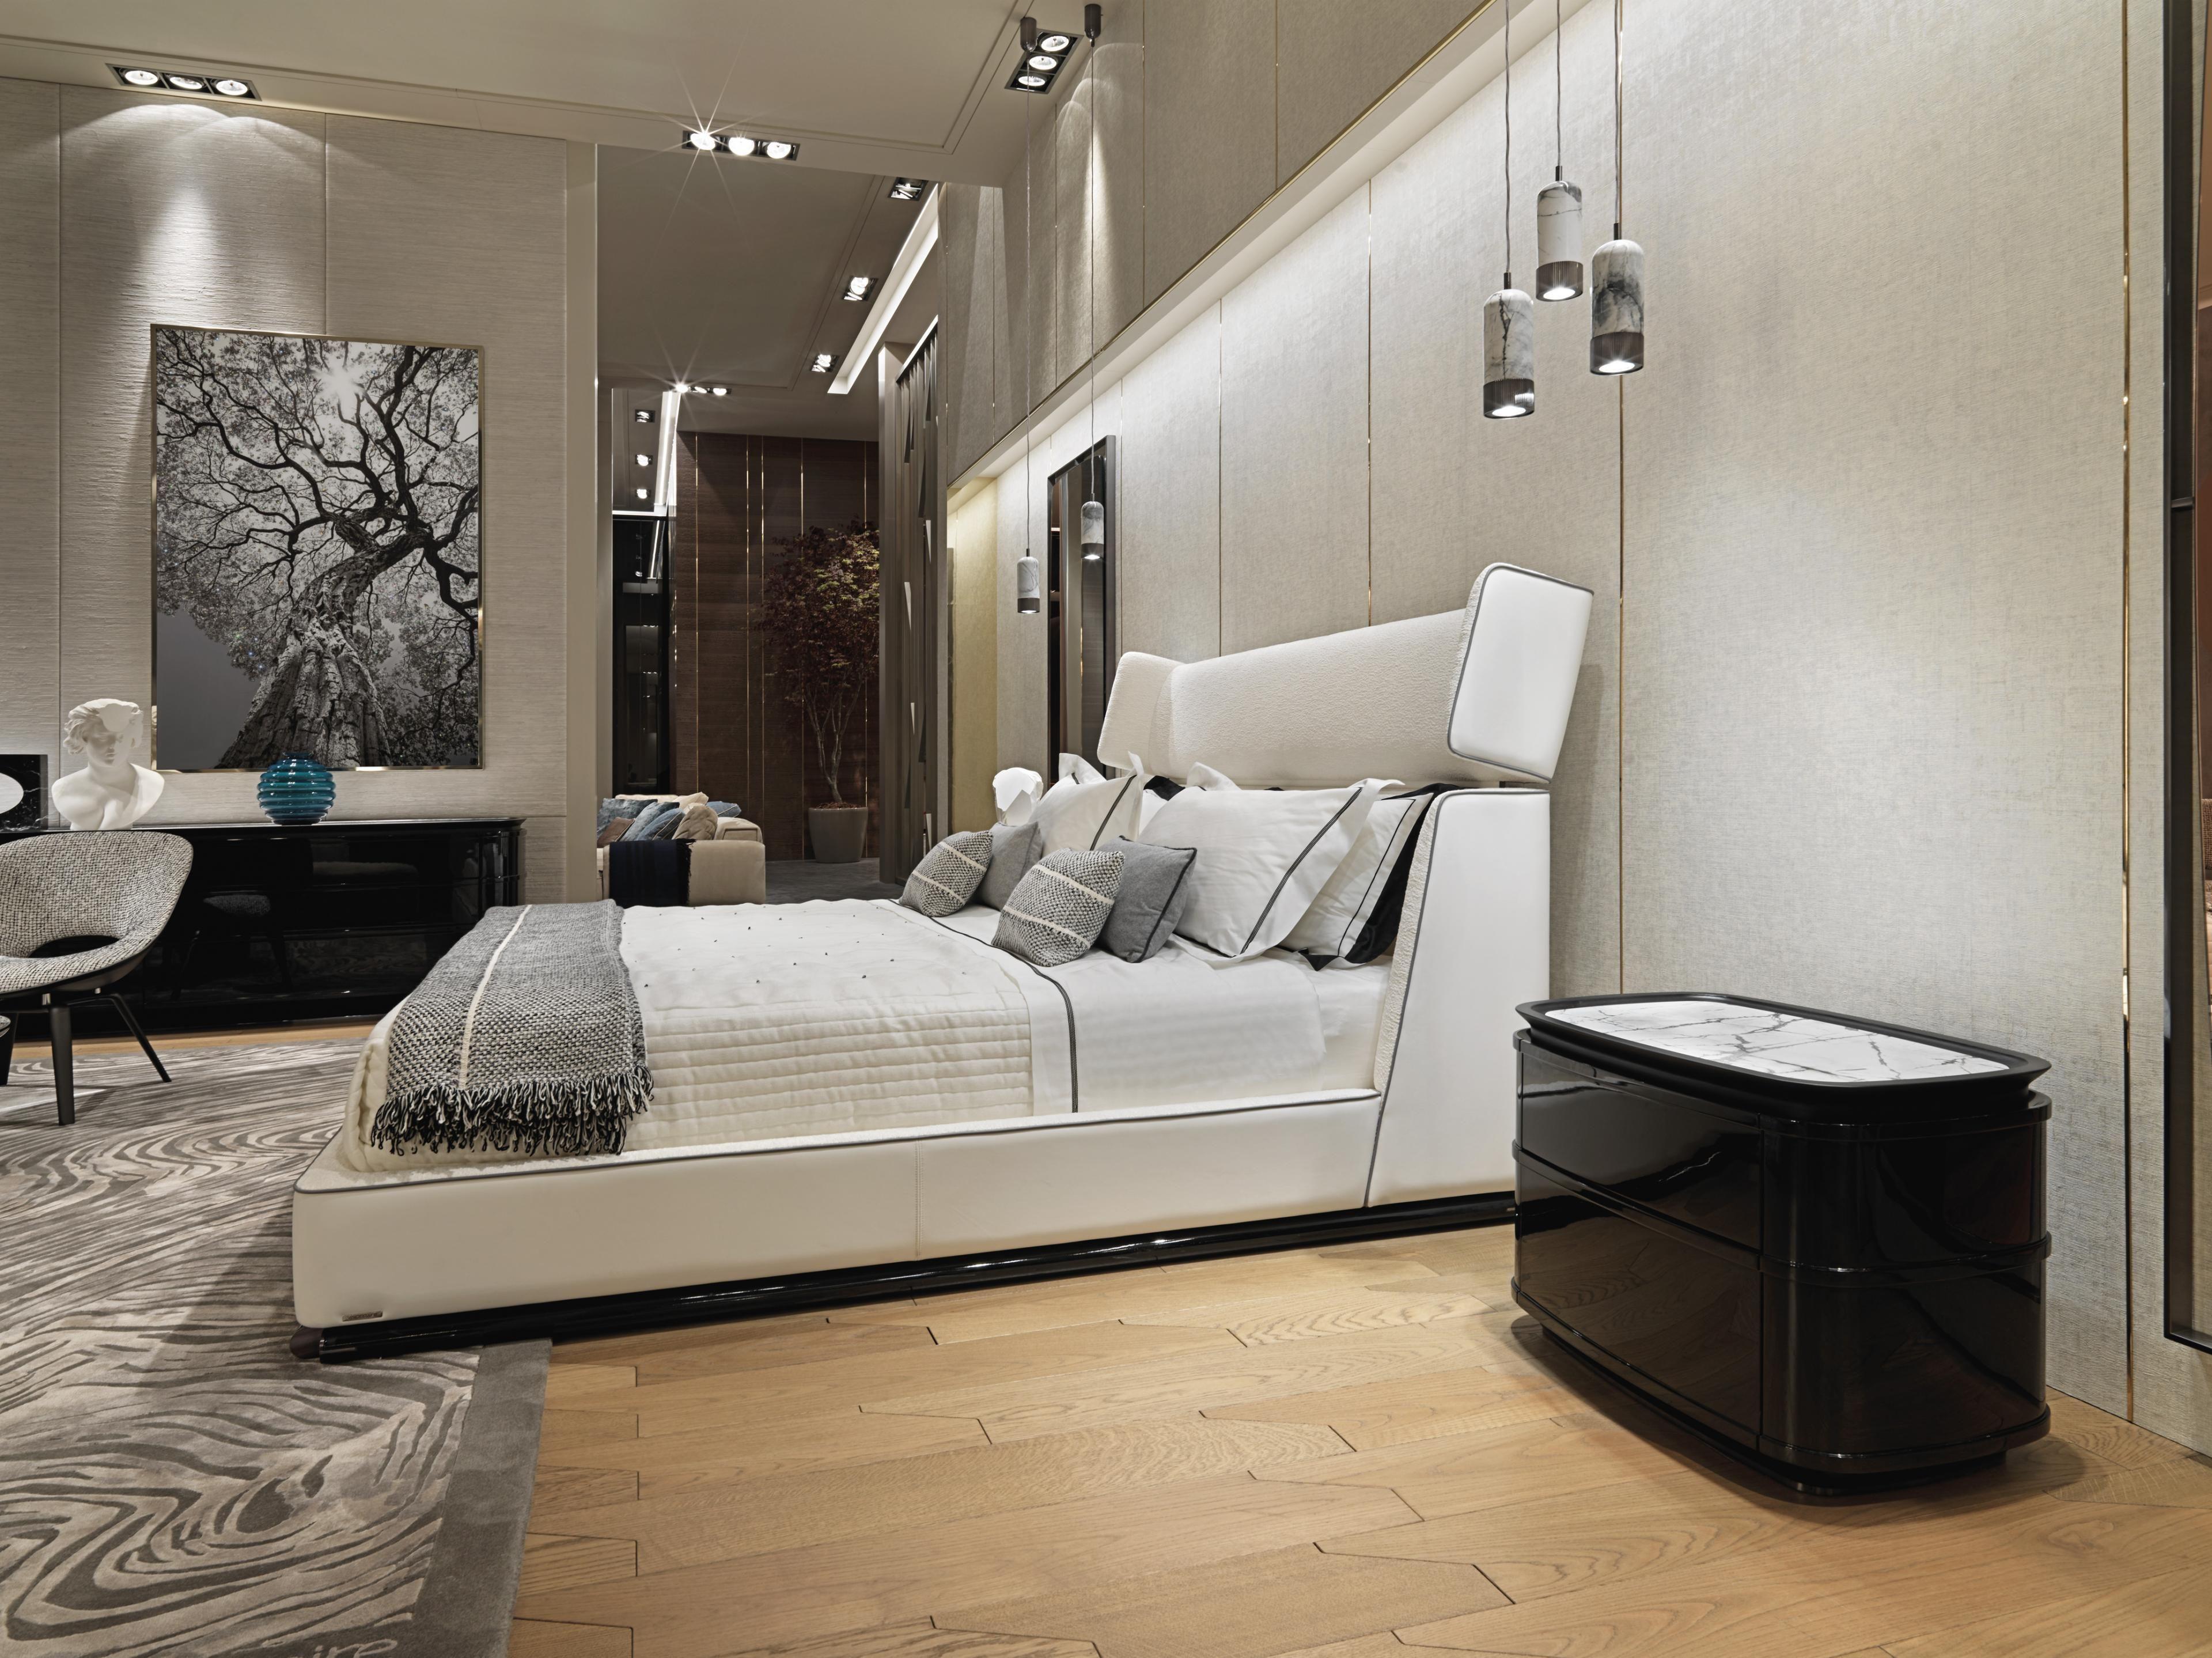 rêverie bedroom simple bedroom interior design bedroom on unique contemporary bedroom design ideas for more inspiration id=95412